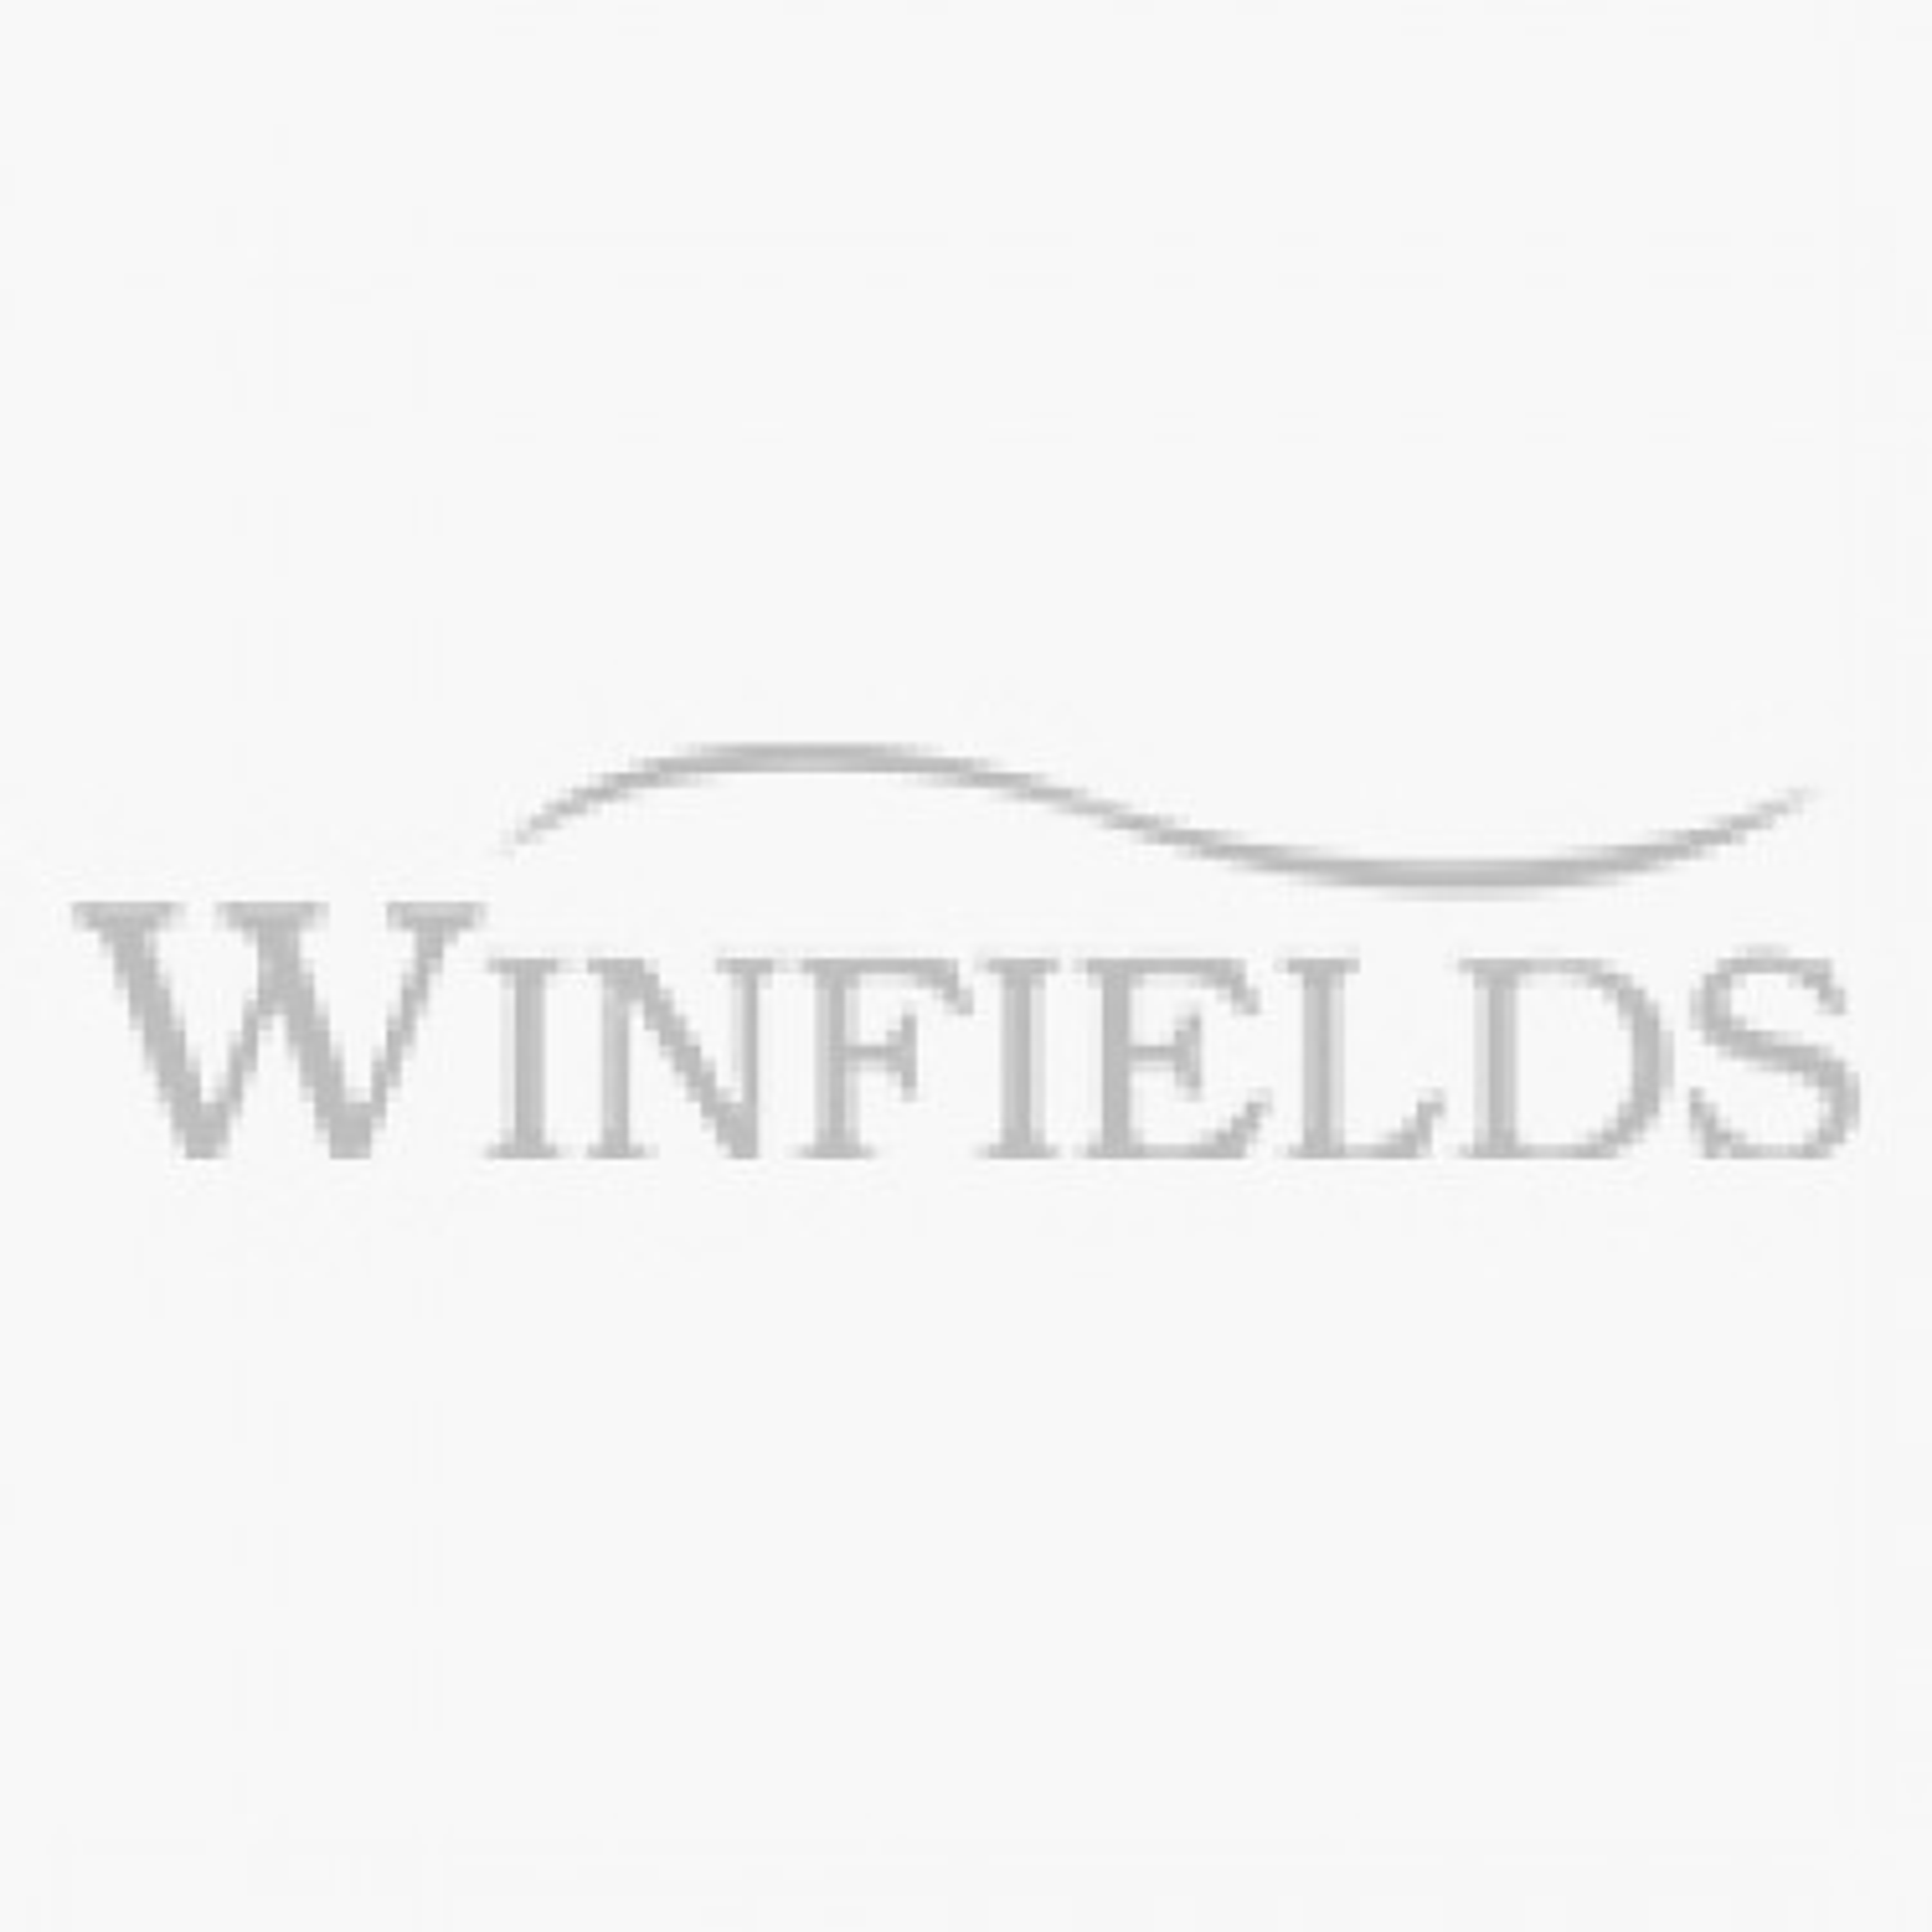 Craghoppers Mens Classic Kiwi Trousers - Bark - 34l